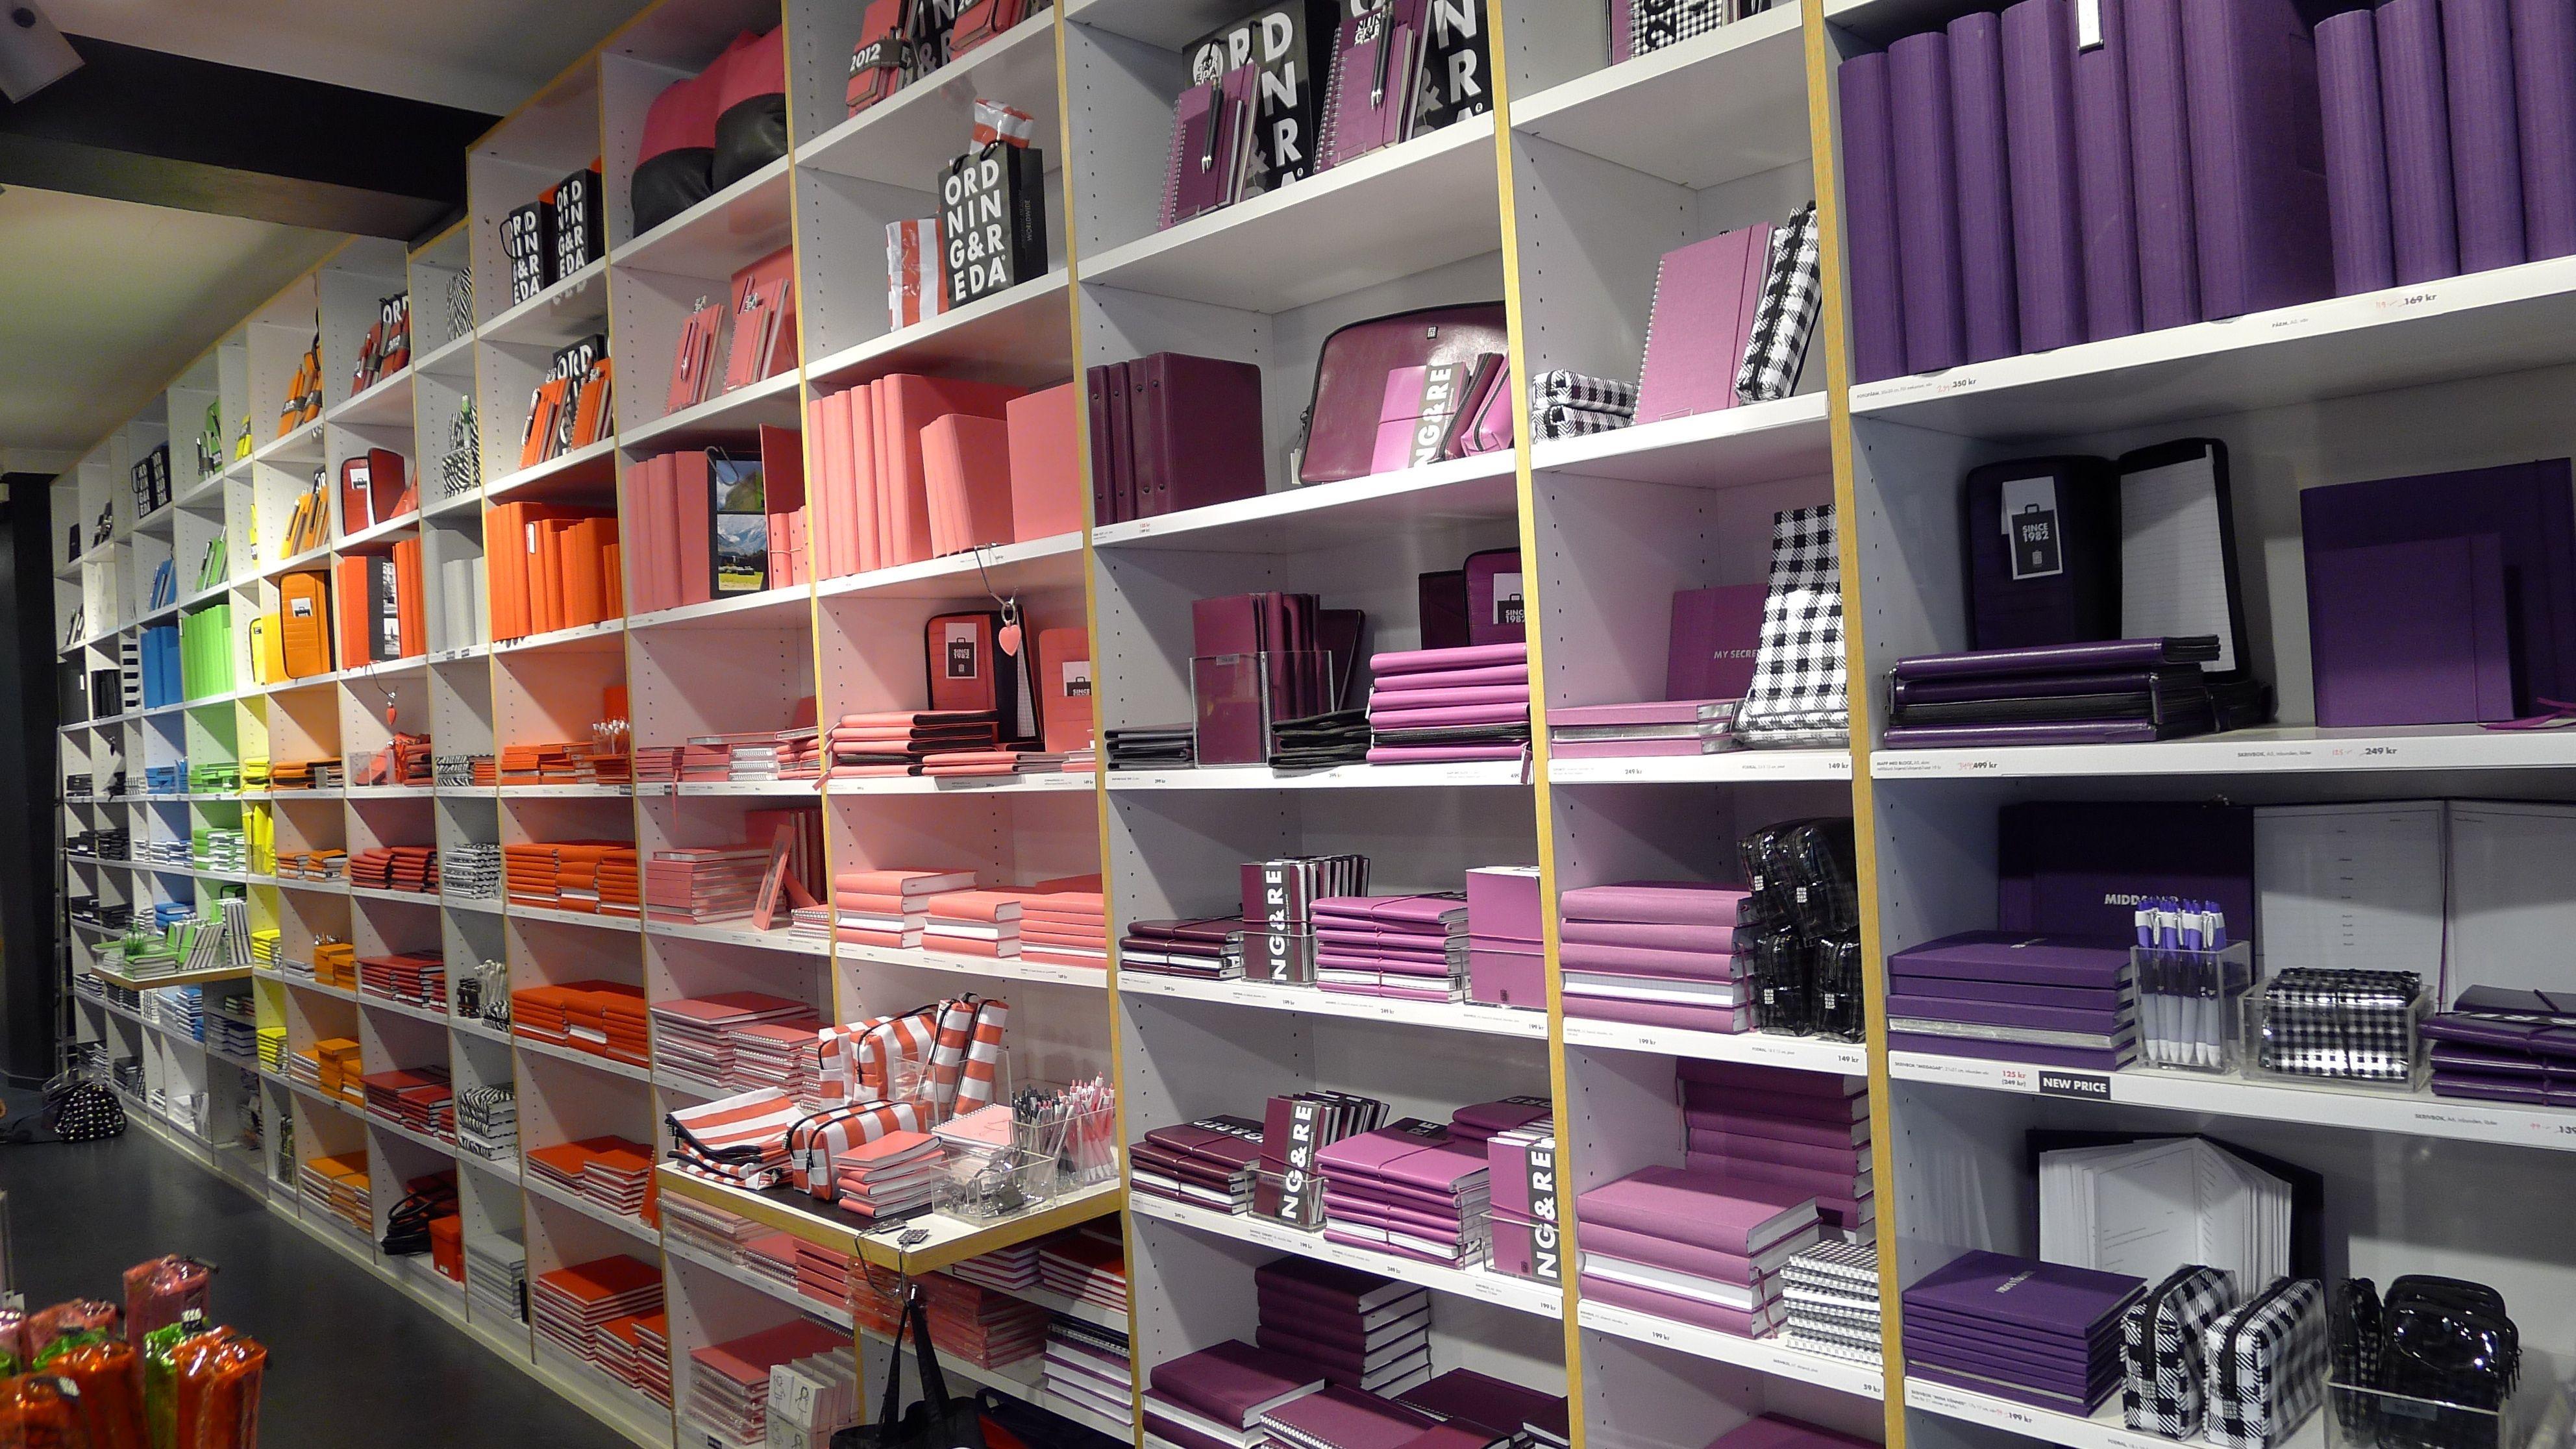 Design Lauren Kirchner Office Supplies Design Beautiful Office Supplies Office Supplies Shop